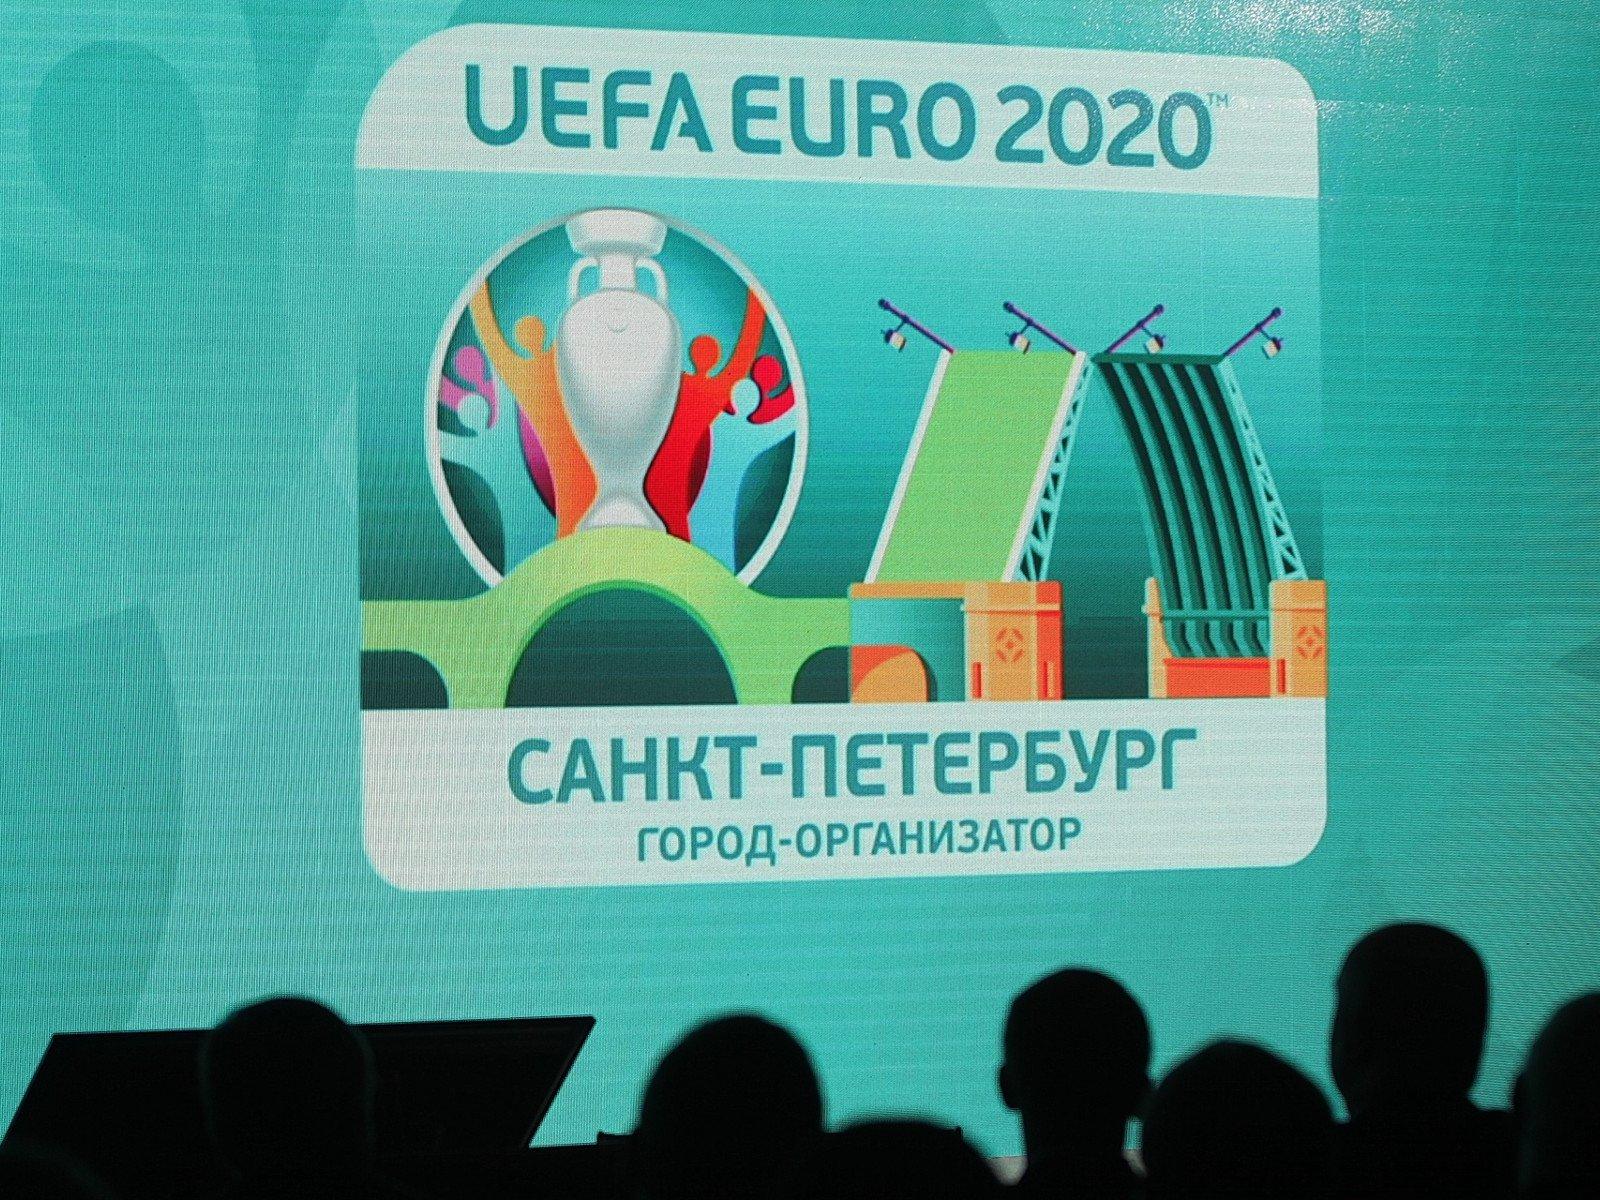 Уверен, Петербург будет отличным организатором Евро— Александер Чеферин